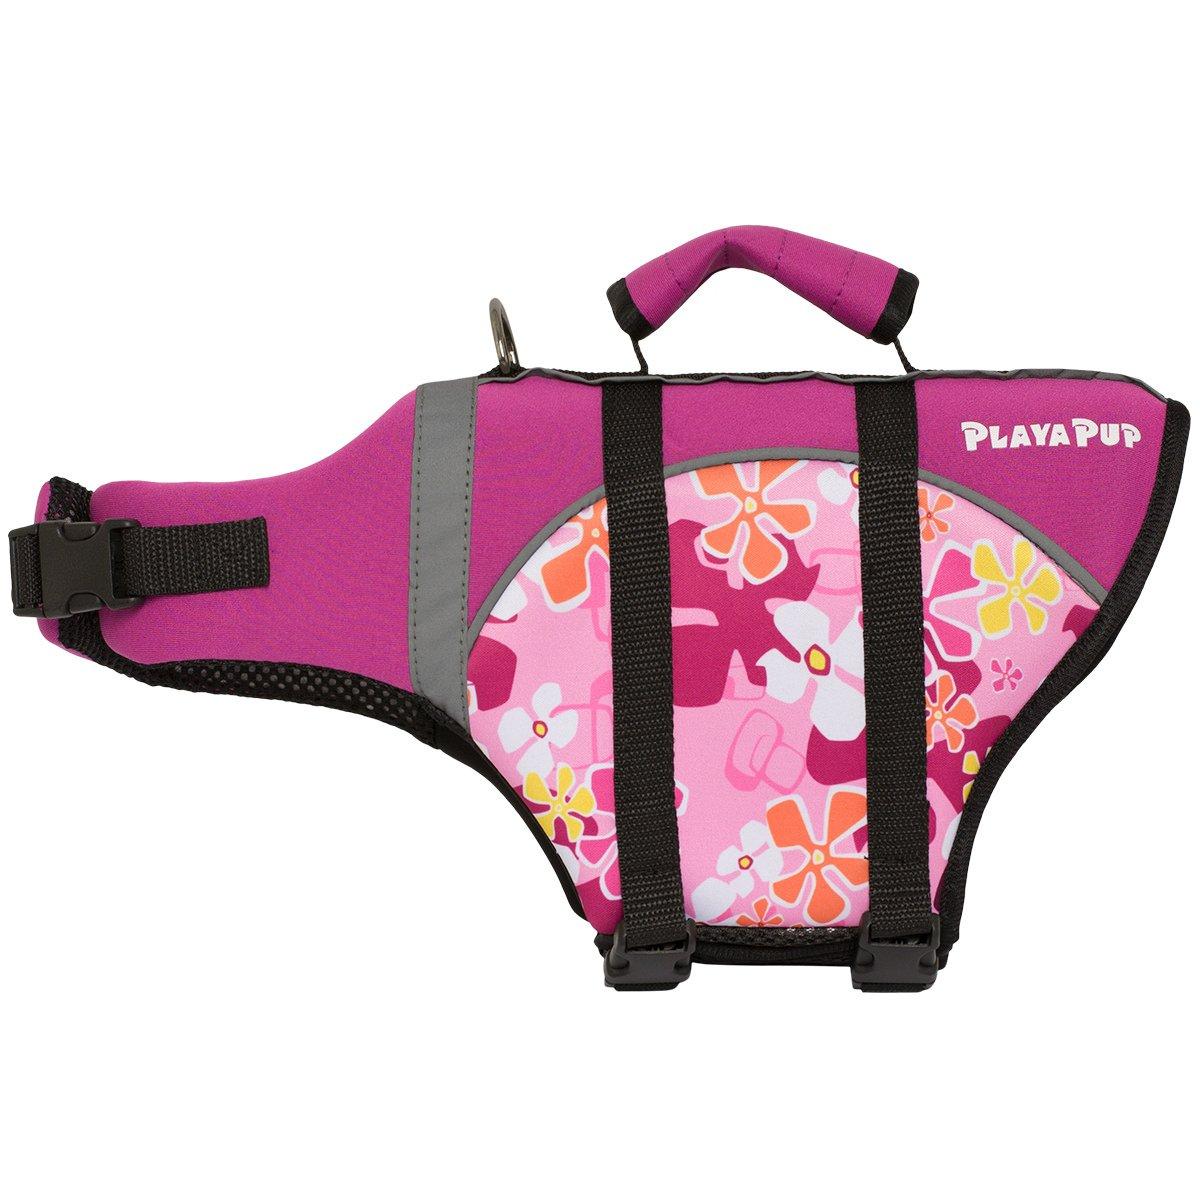 PlayaPup Dog Life Jacket, Misty Pink, Large by PlayaPup